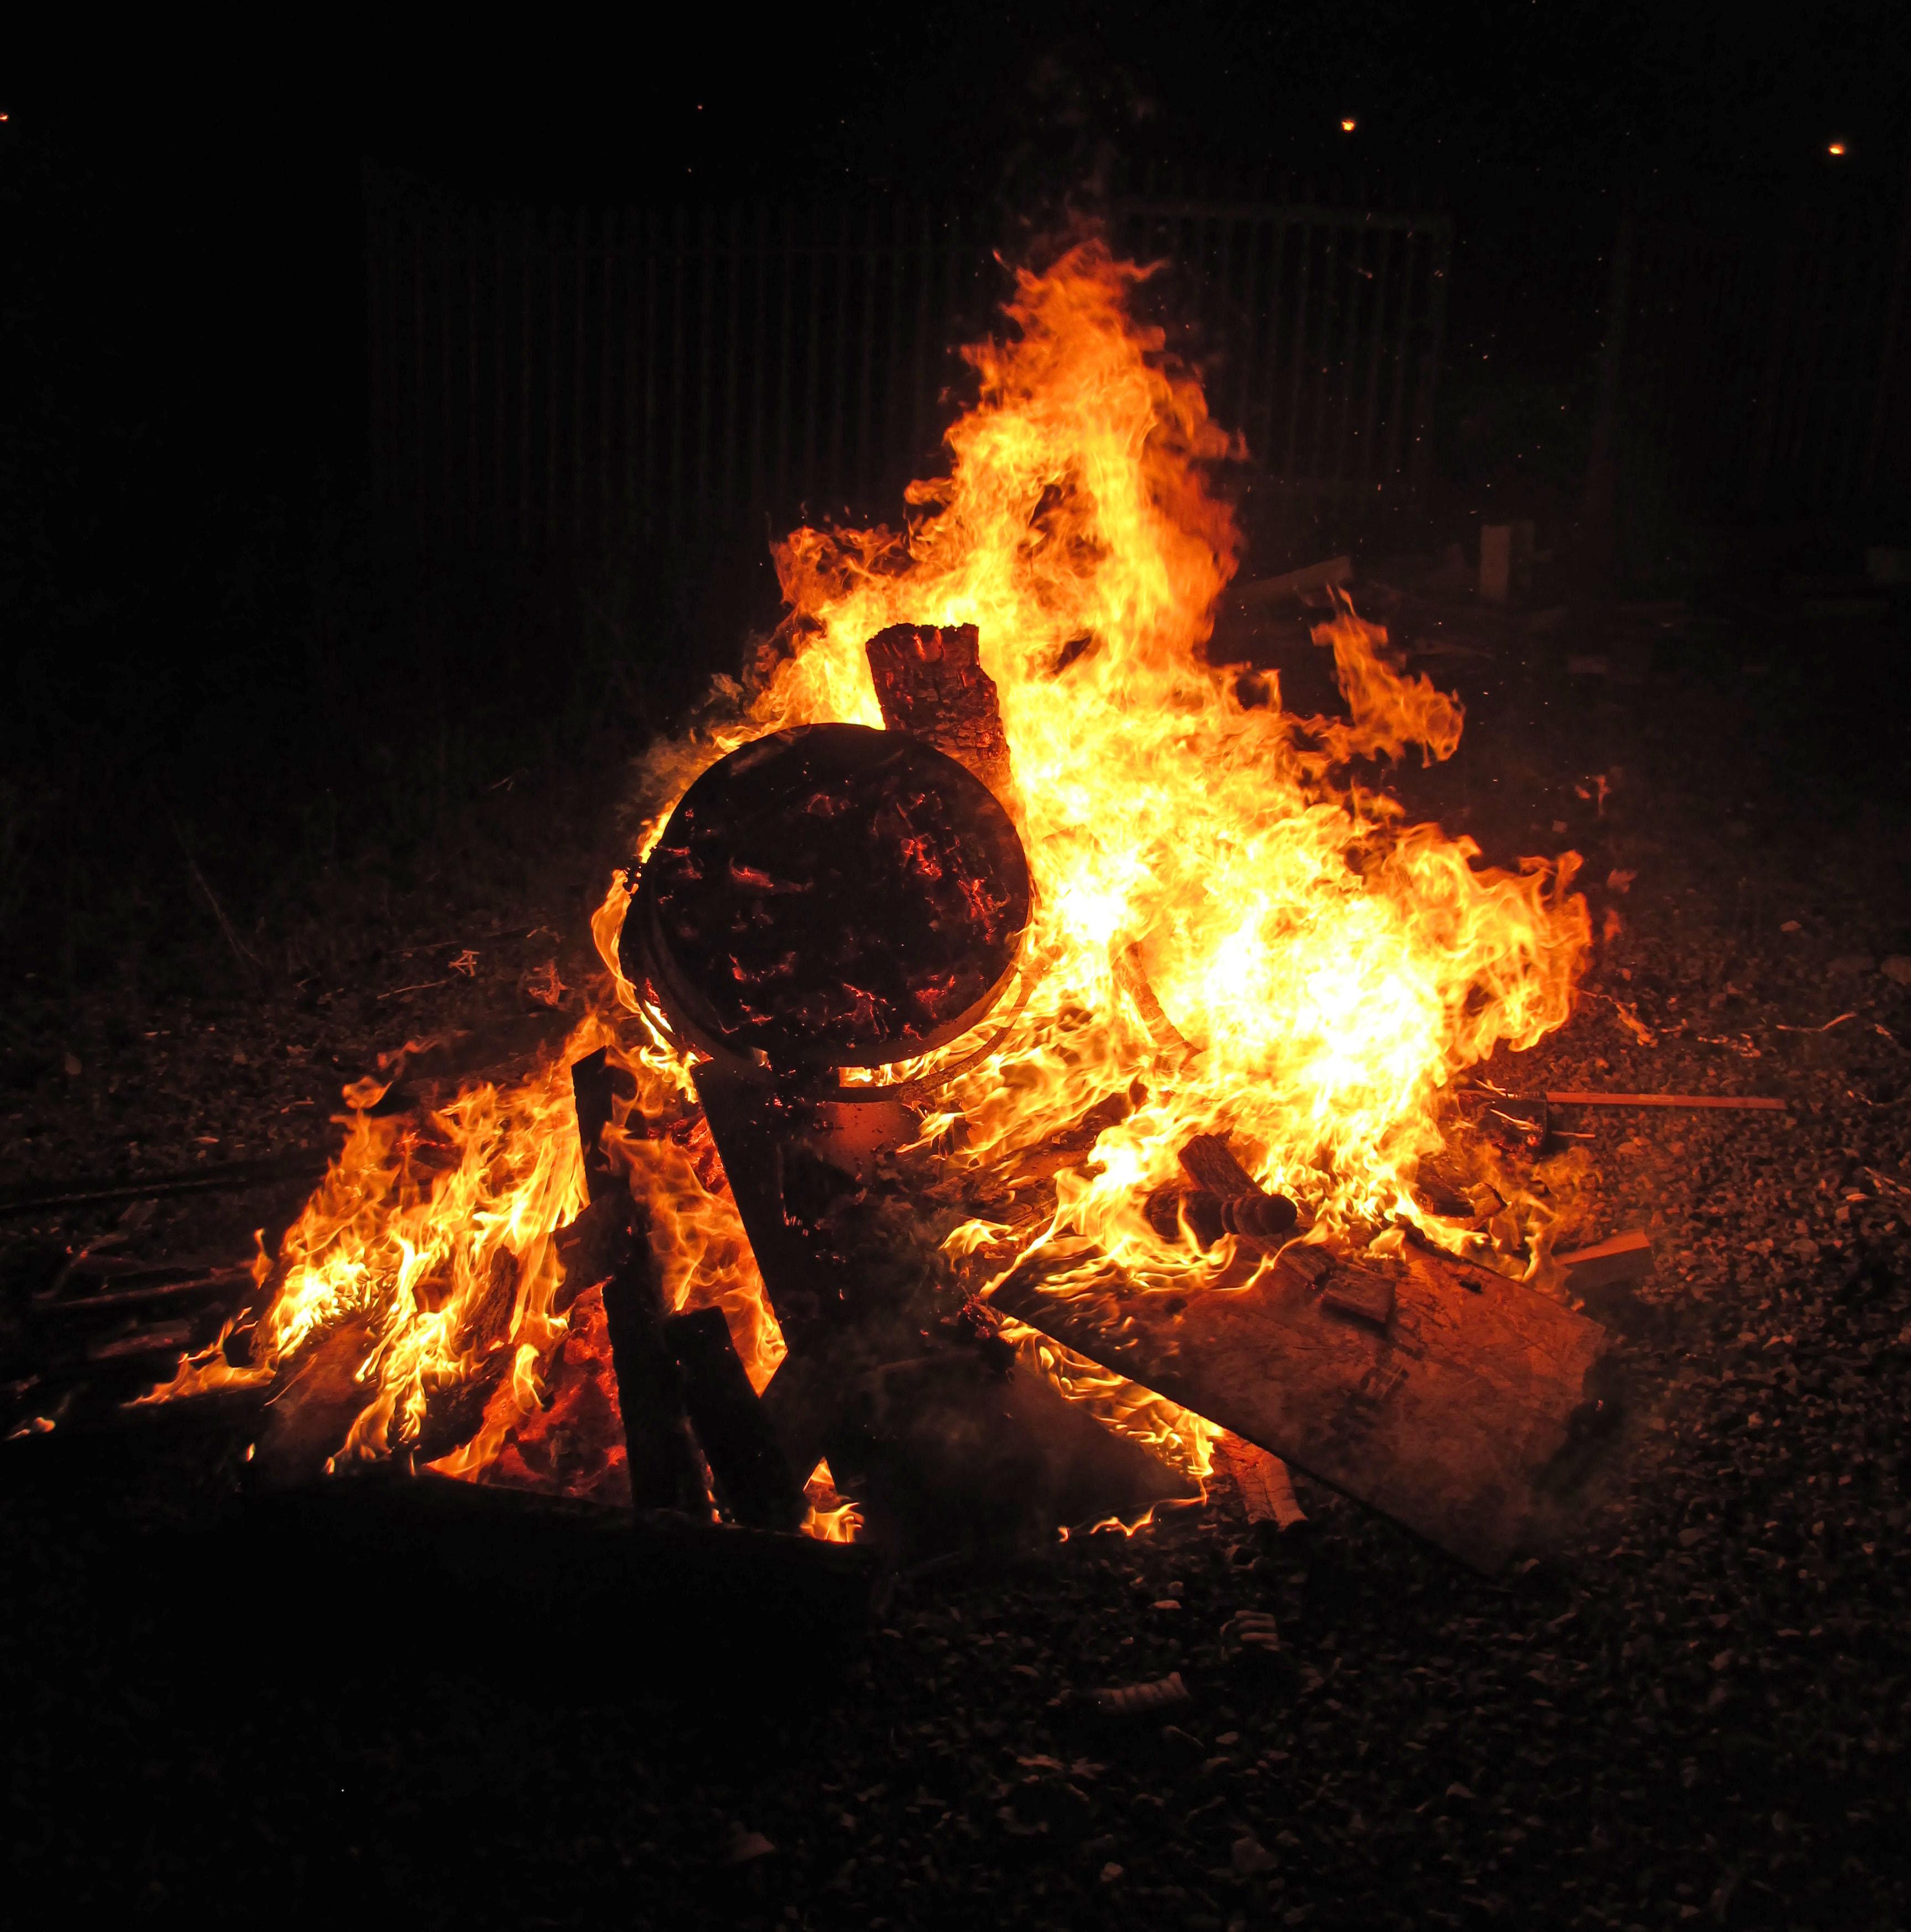 Bonfire 20151031 v2